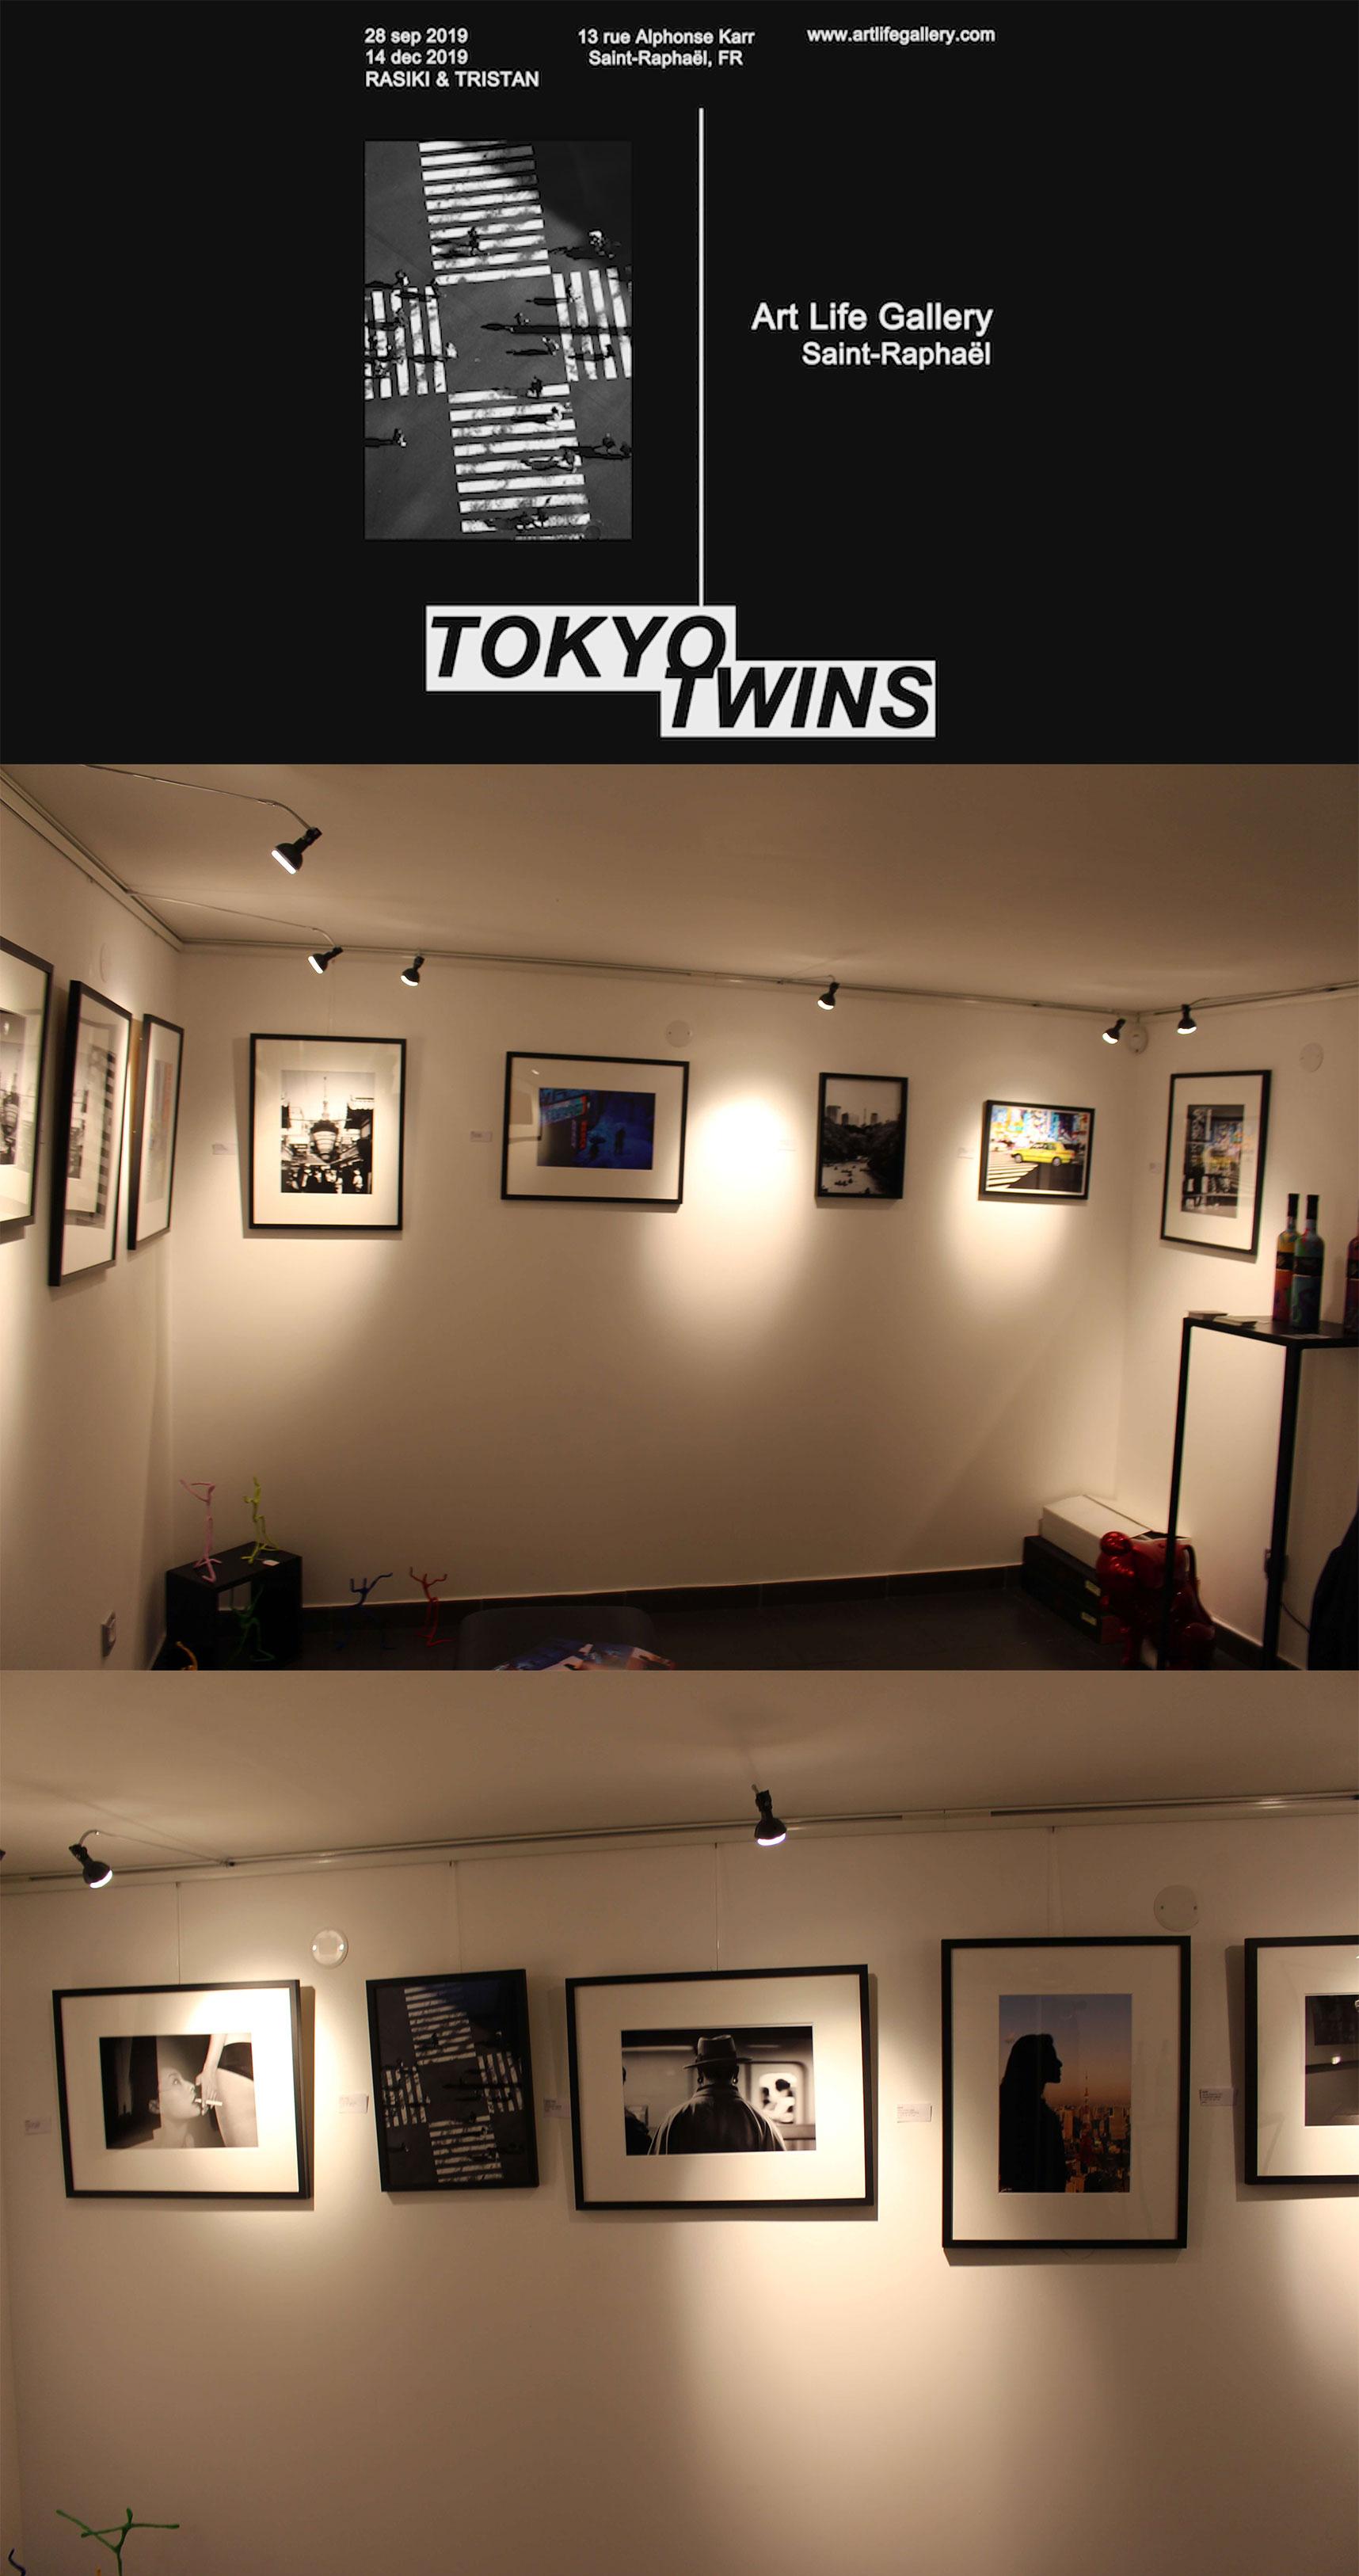 EXHIBITION - Art Life Gallery